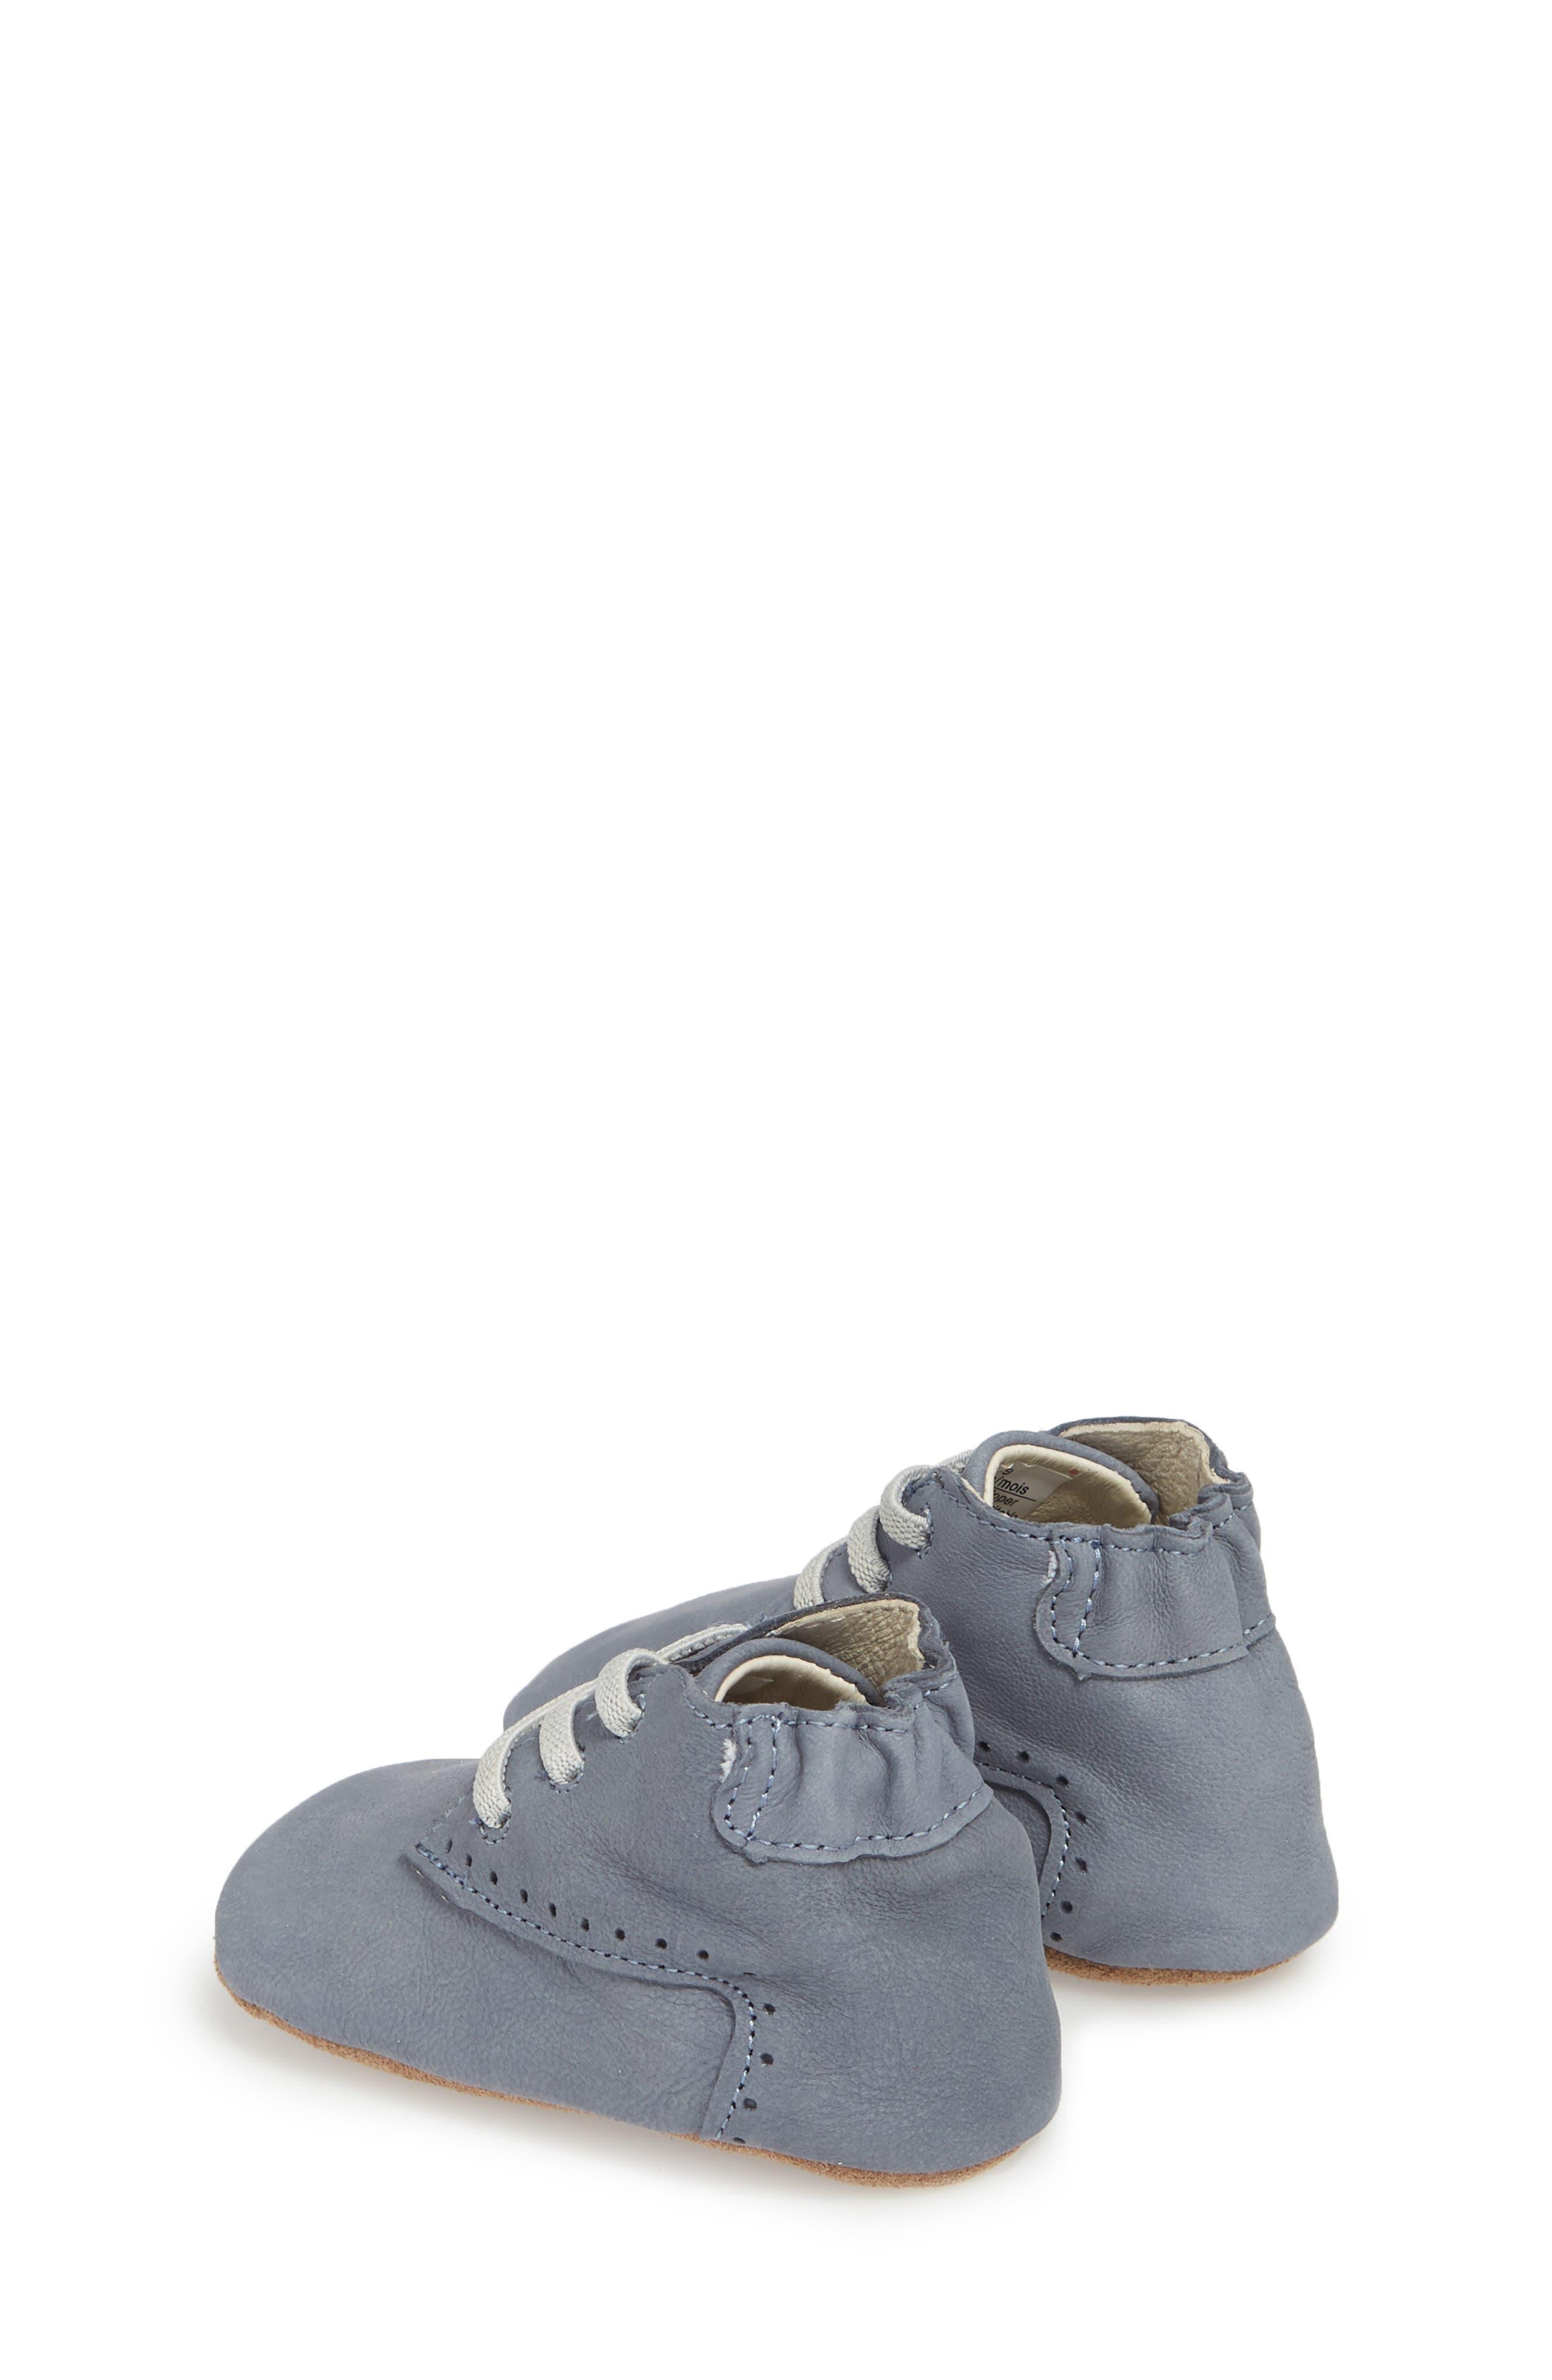 pin superstar crib adidas shoes toms i floral cribs belgium